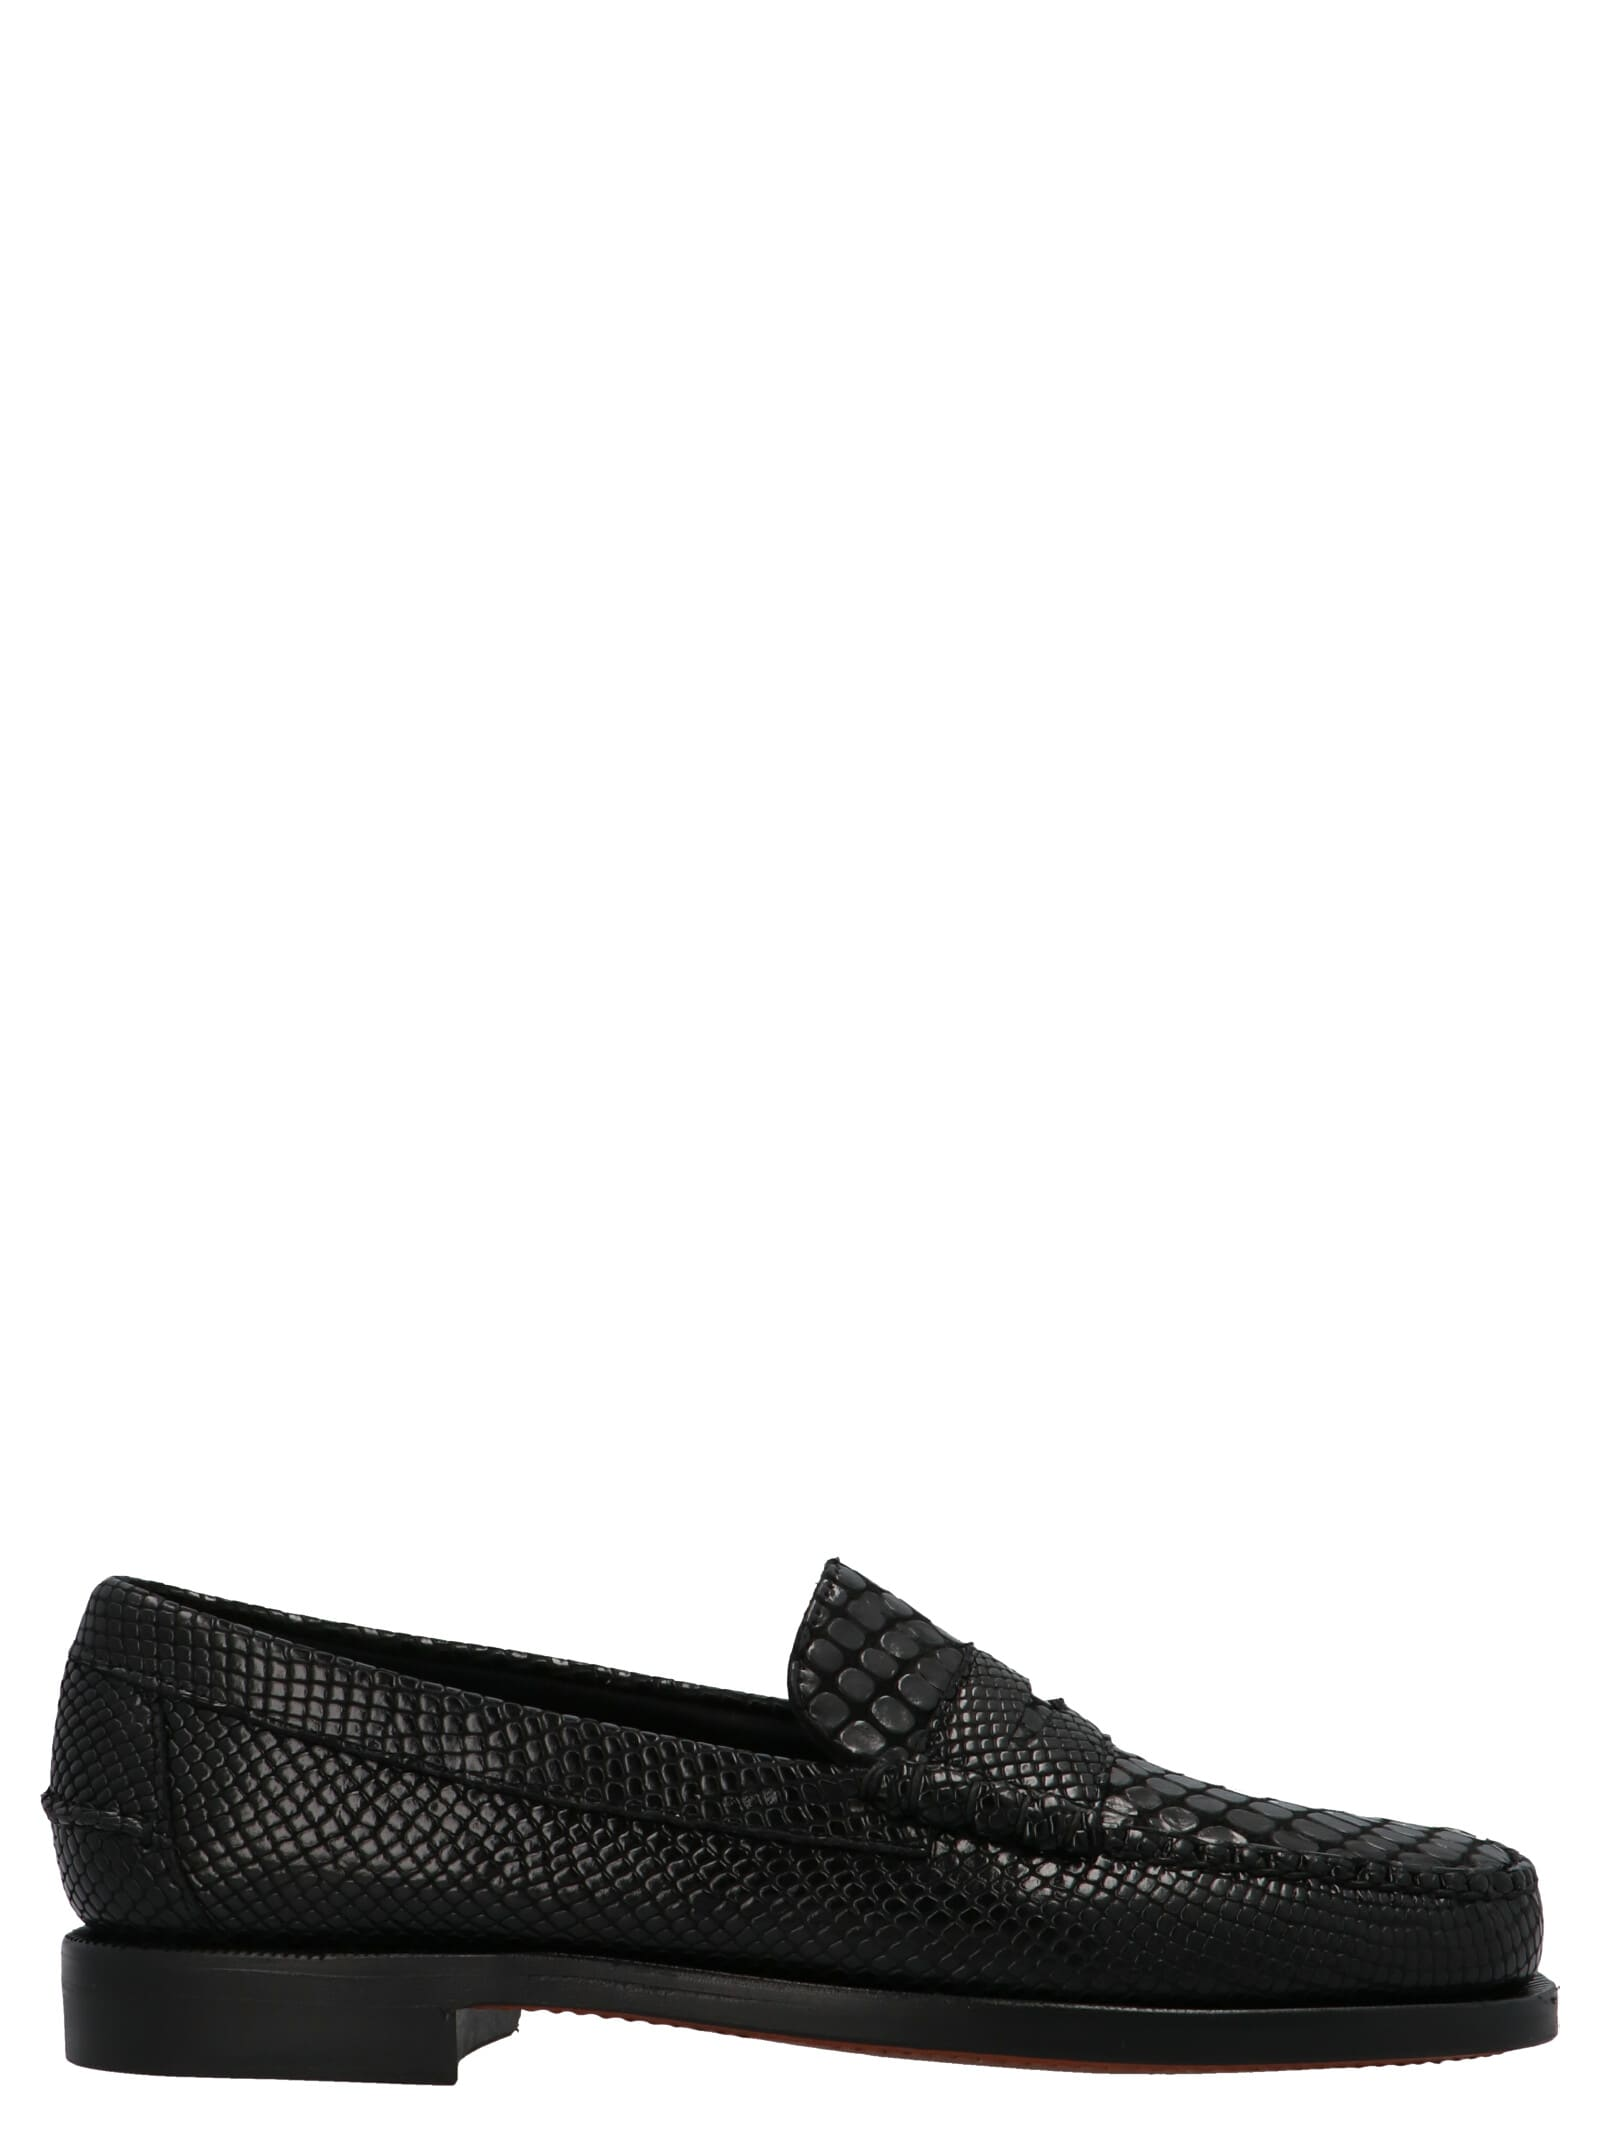 Sebago dan Cocco Shoes